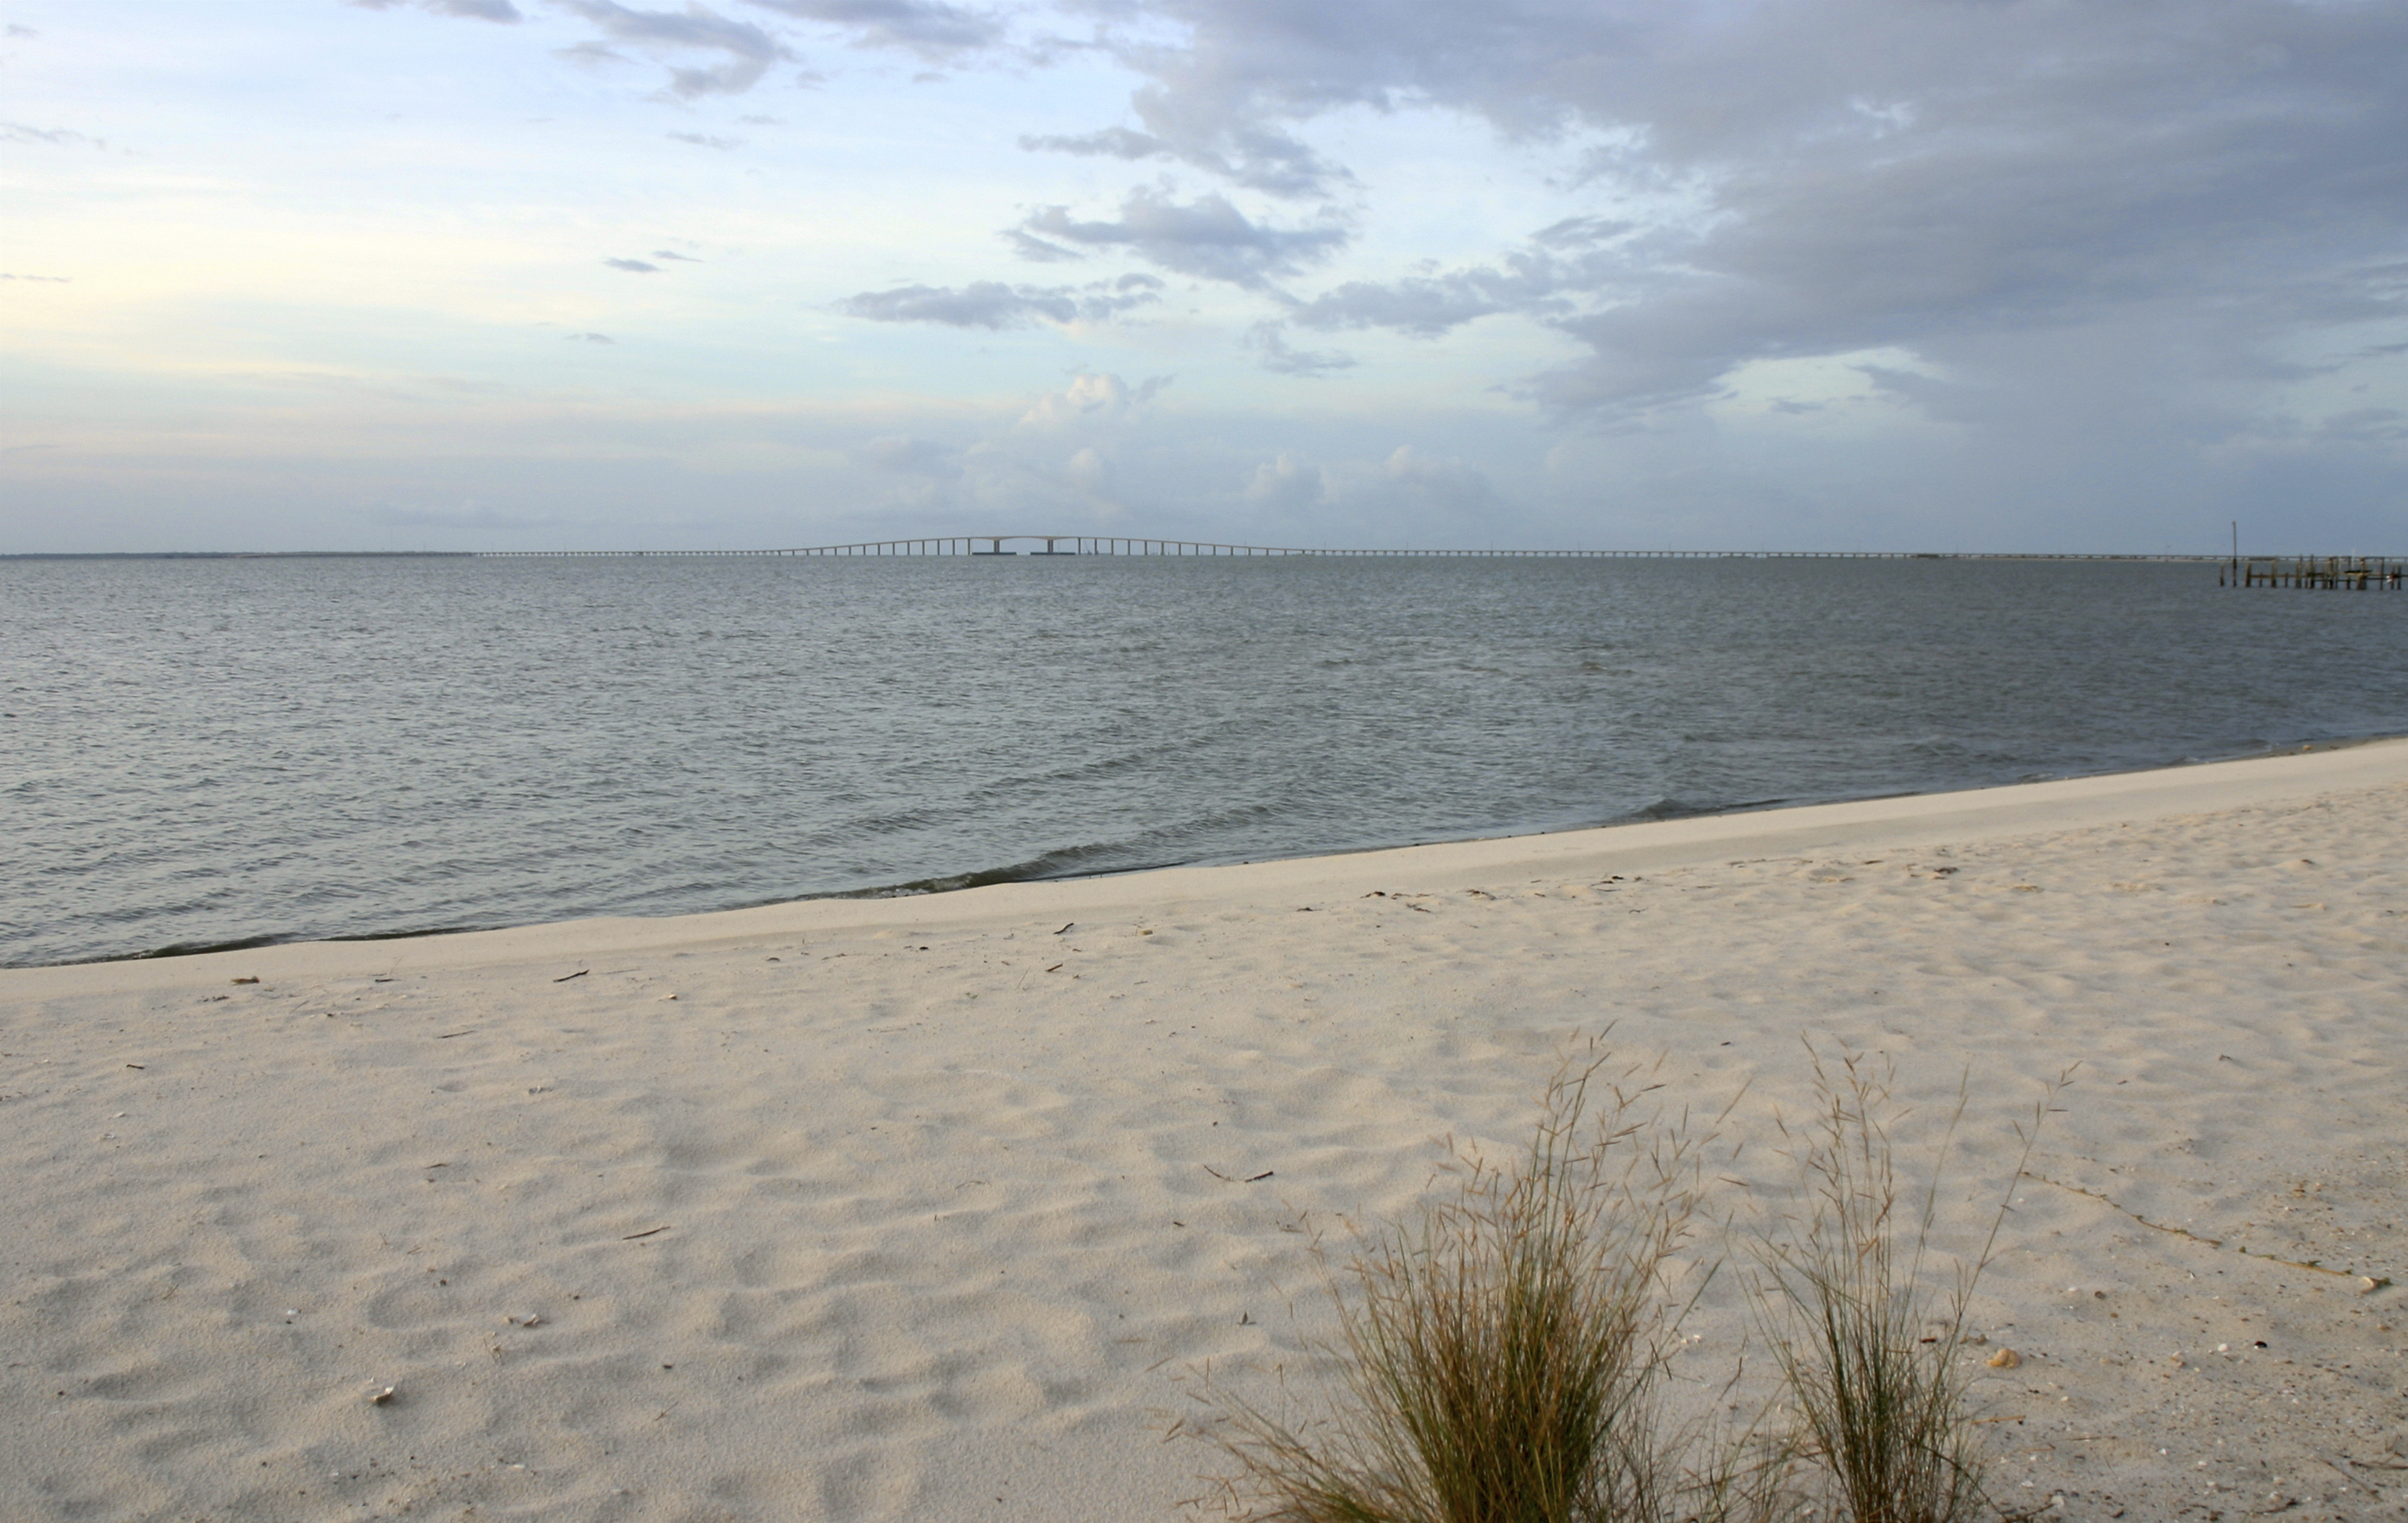 Explore Alabama's beaches